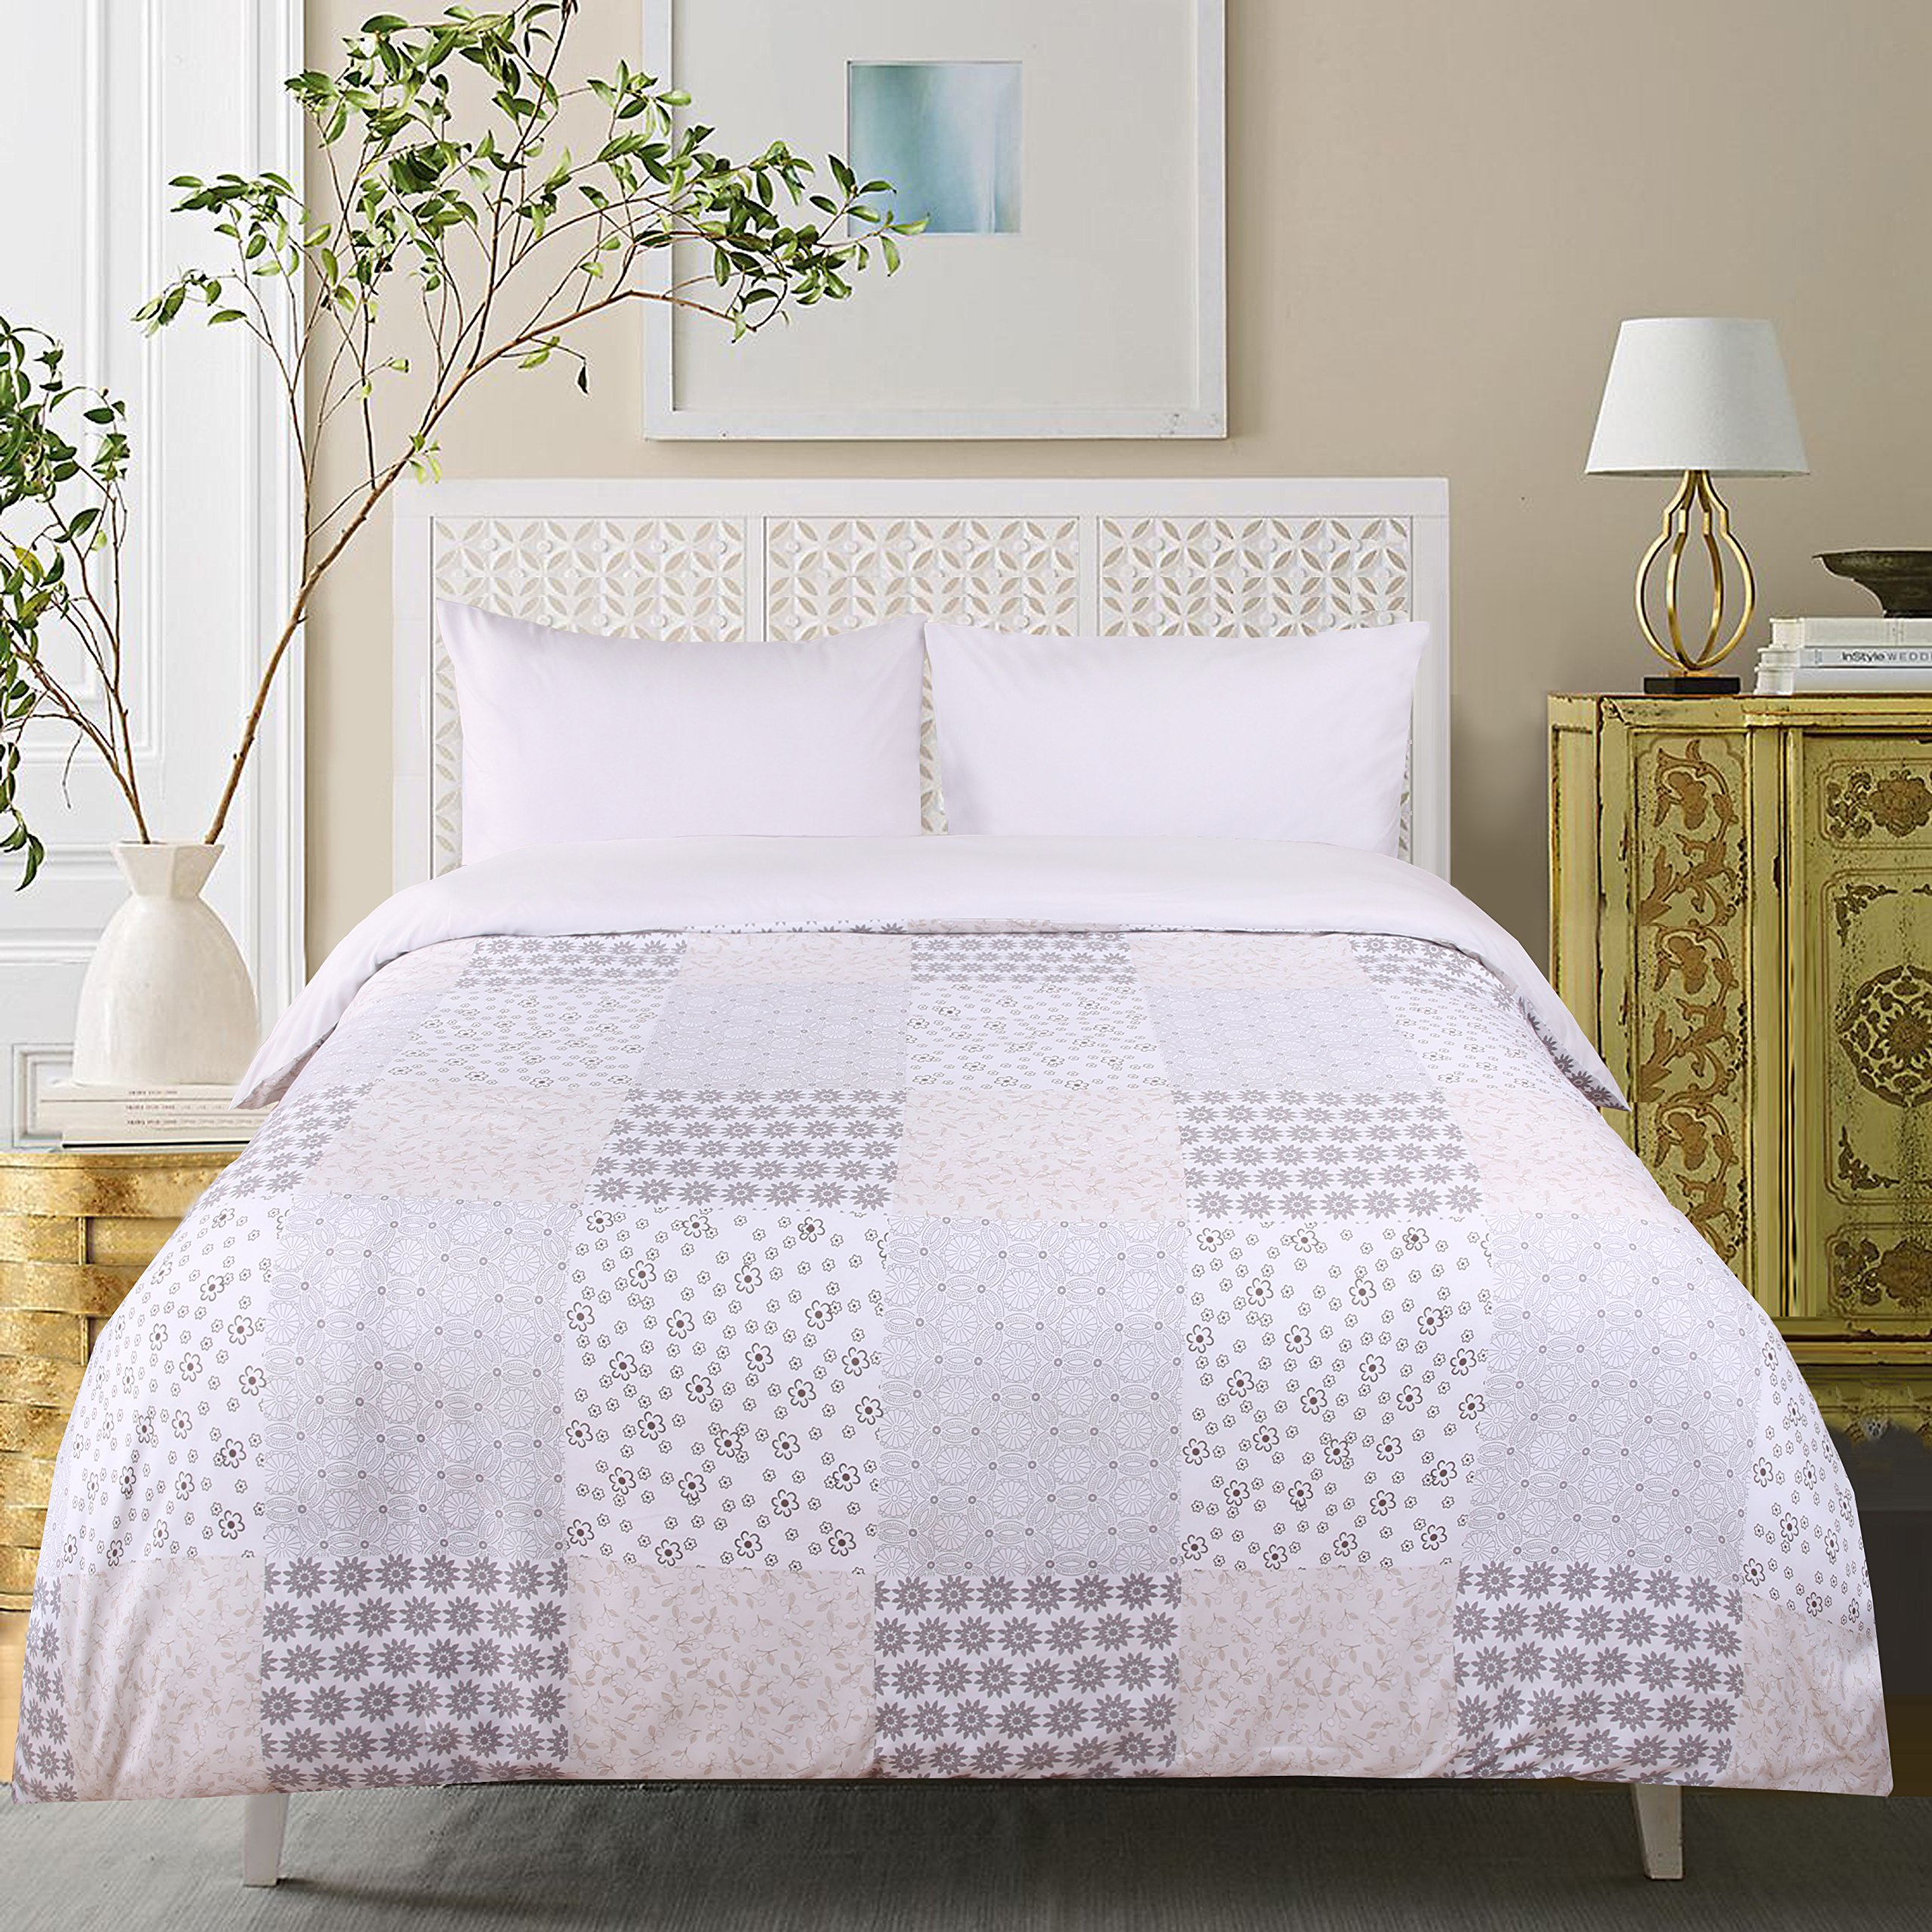 PuTian Home-PrintedDuvet/CoverSets Velvety,Luxurious,Comfortable,Breathable 5Star Hotel PaisleyQueen